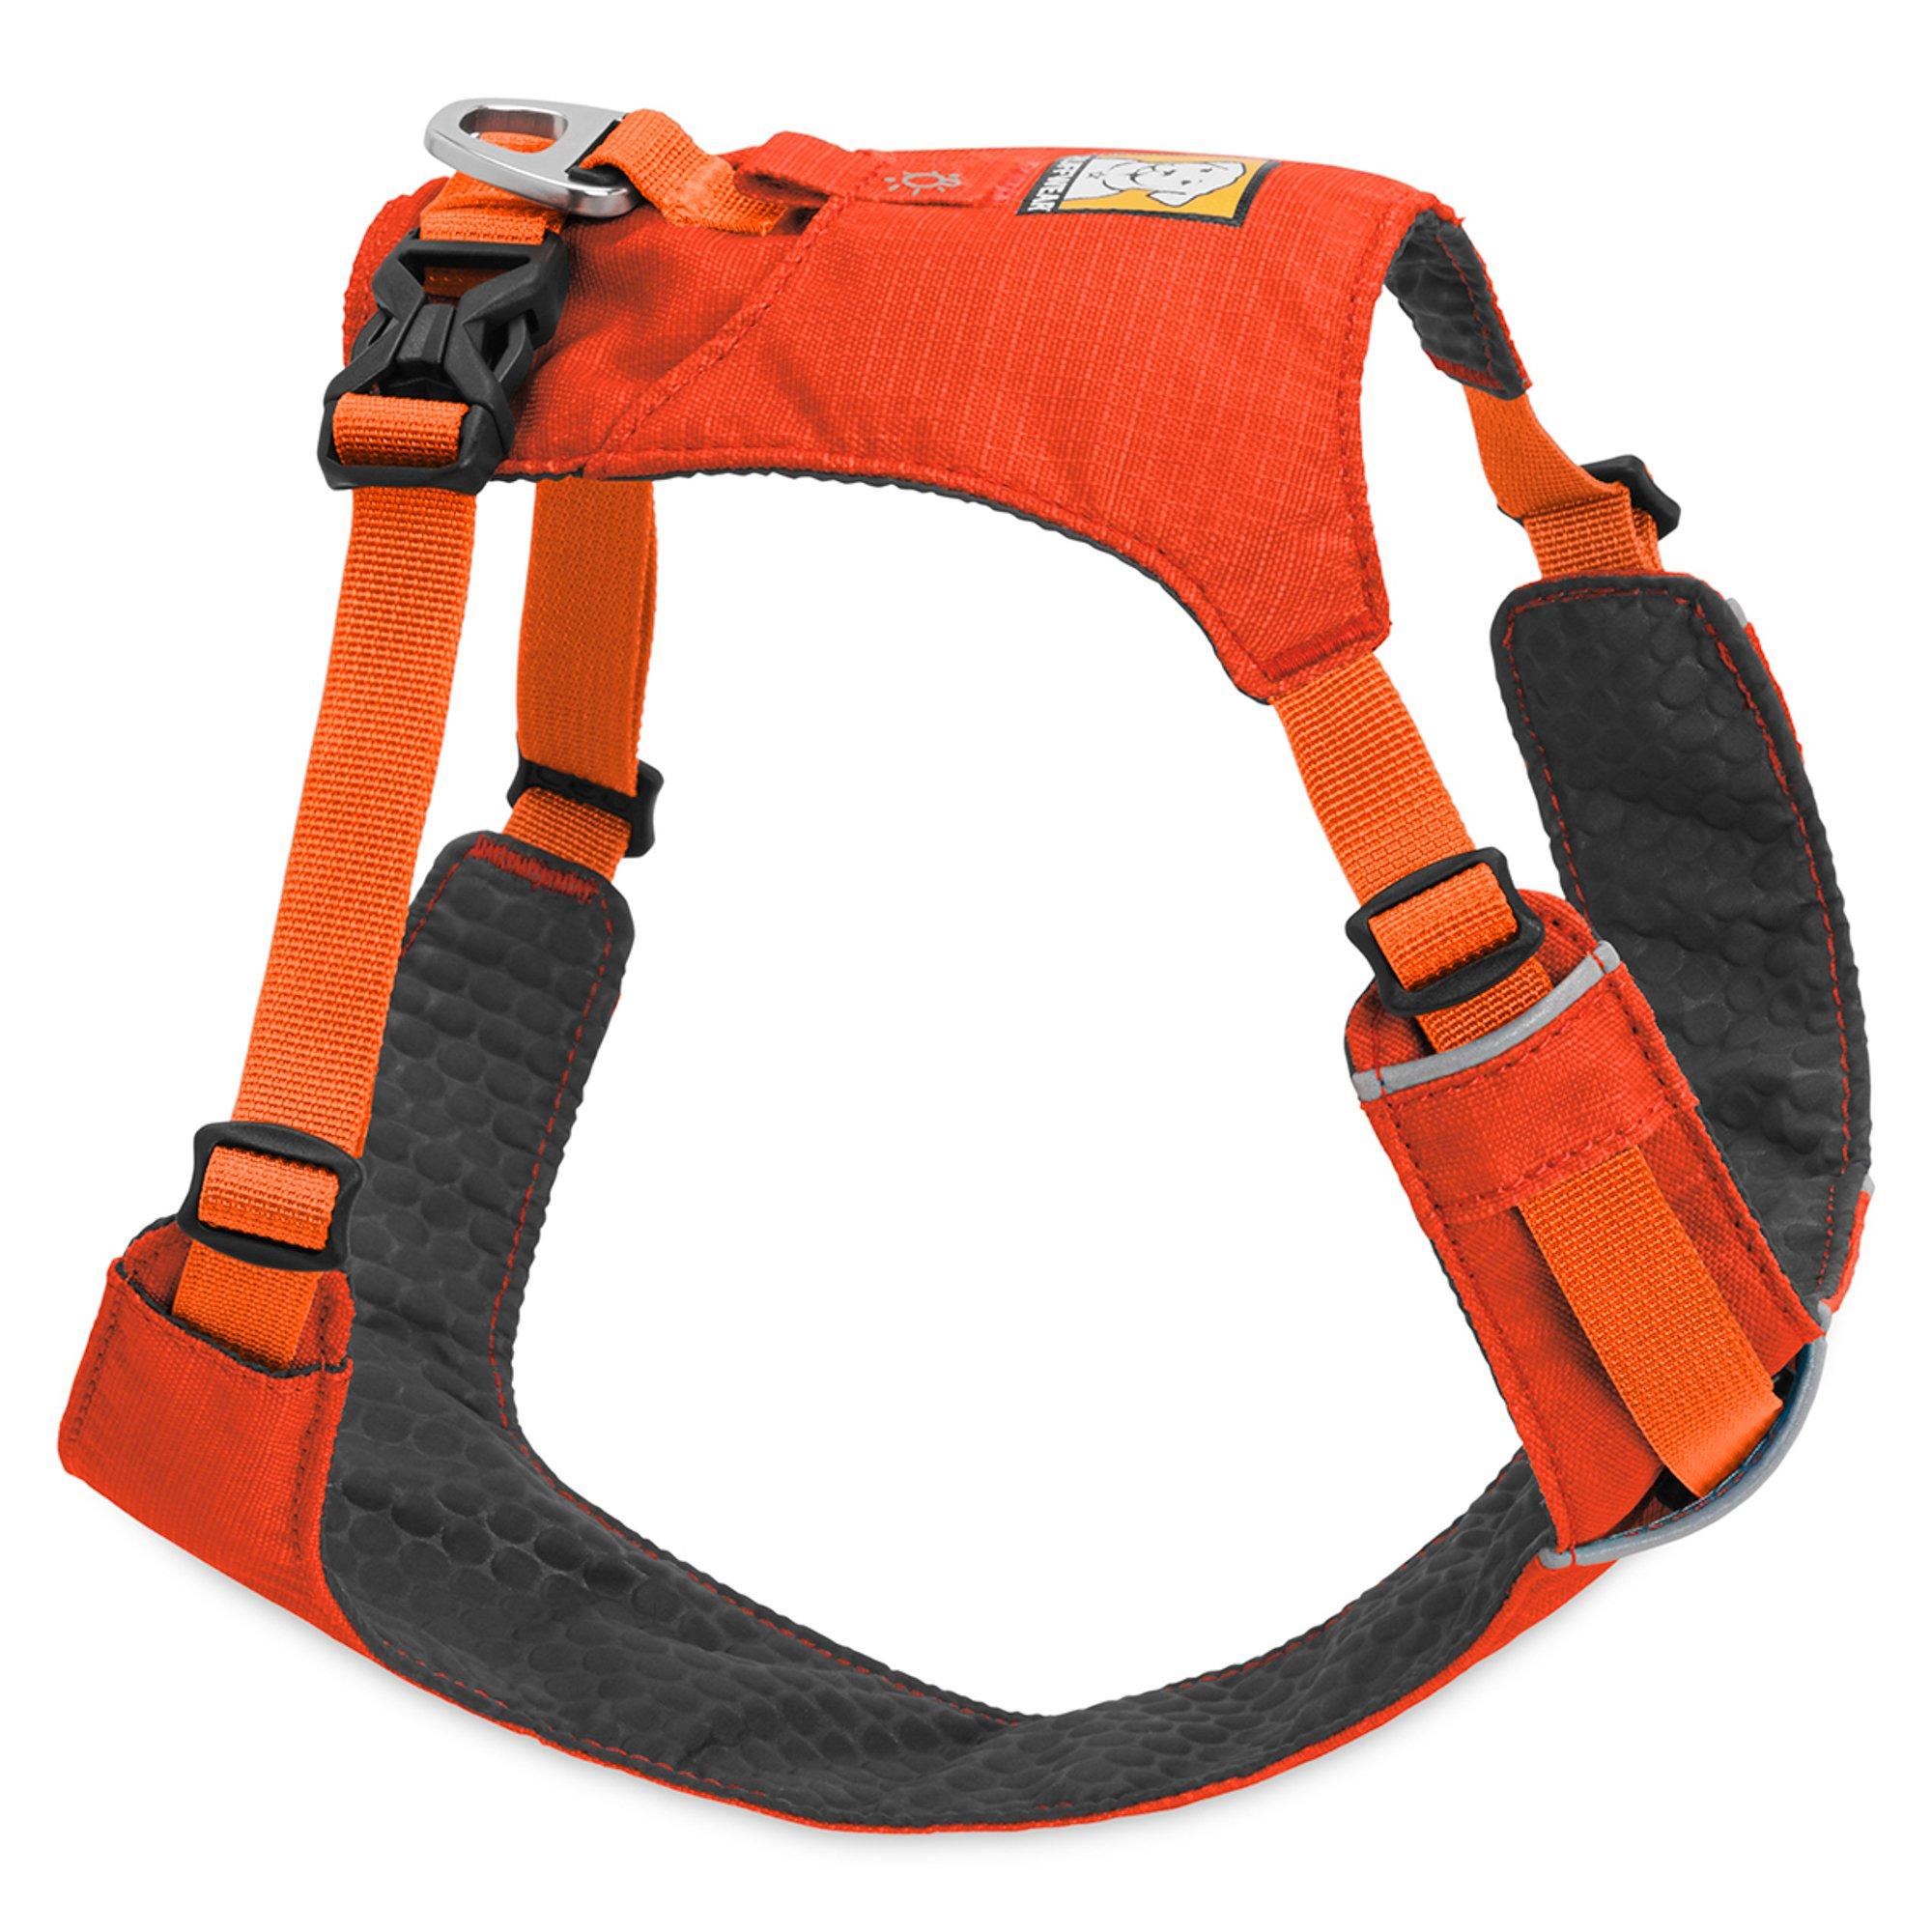 RUFFWEAR - Hi & Light Lightweight Dog Harness, Sockeye Red, Medium